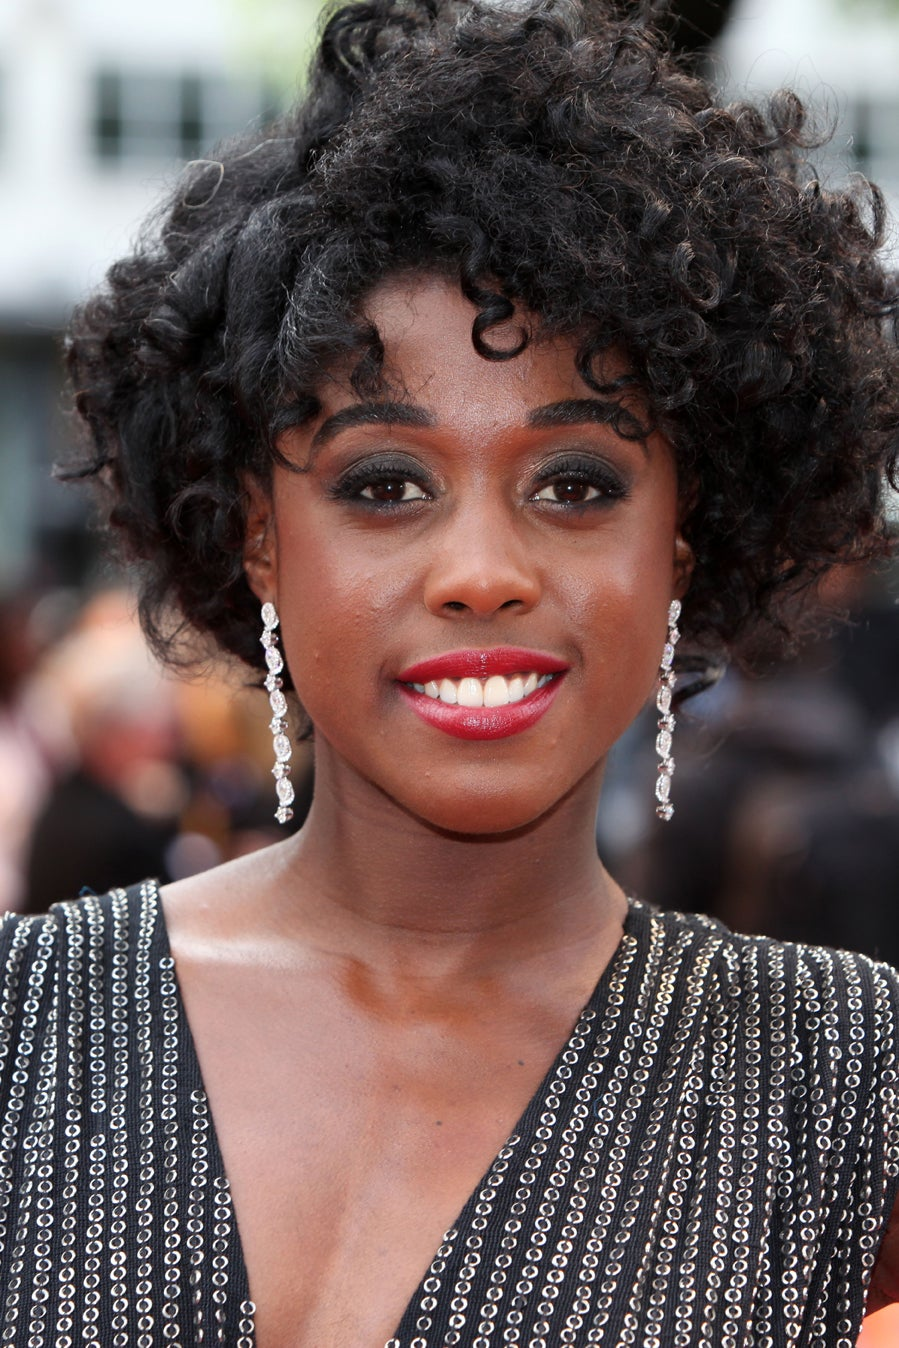 Lashana Lynch Lands Lead Role in Shondaland's 'Romeo & Juliet' Sequel